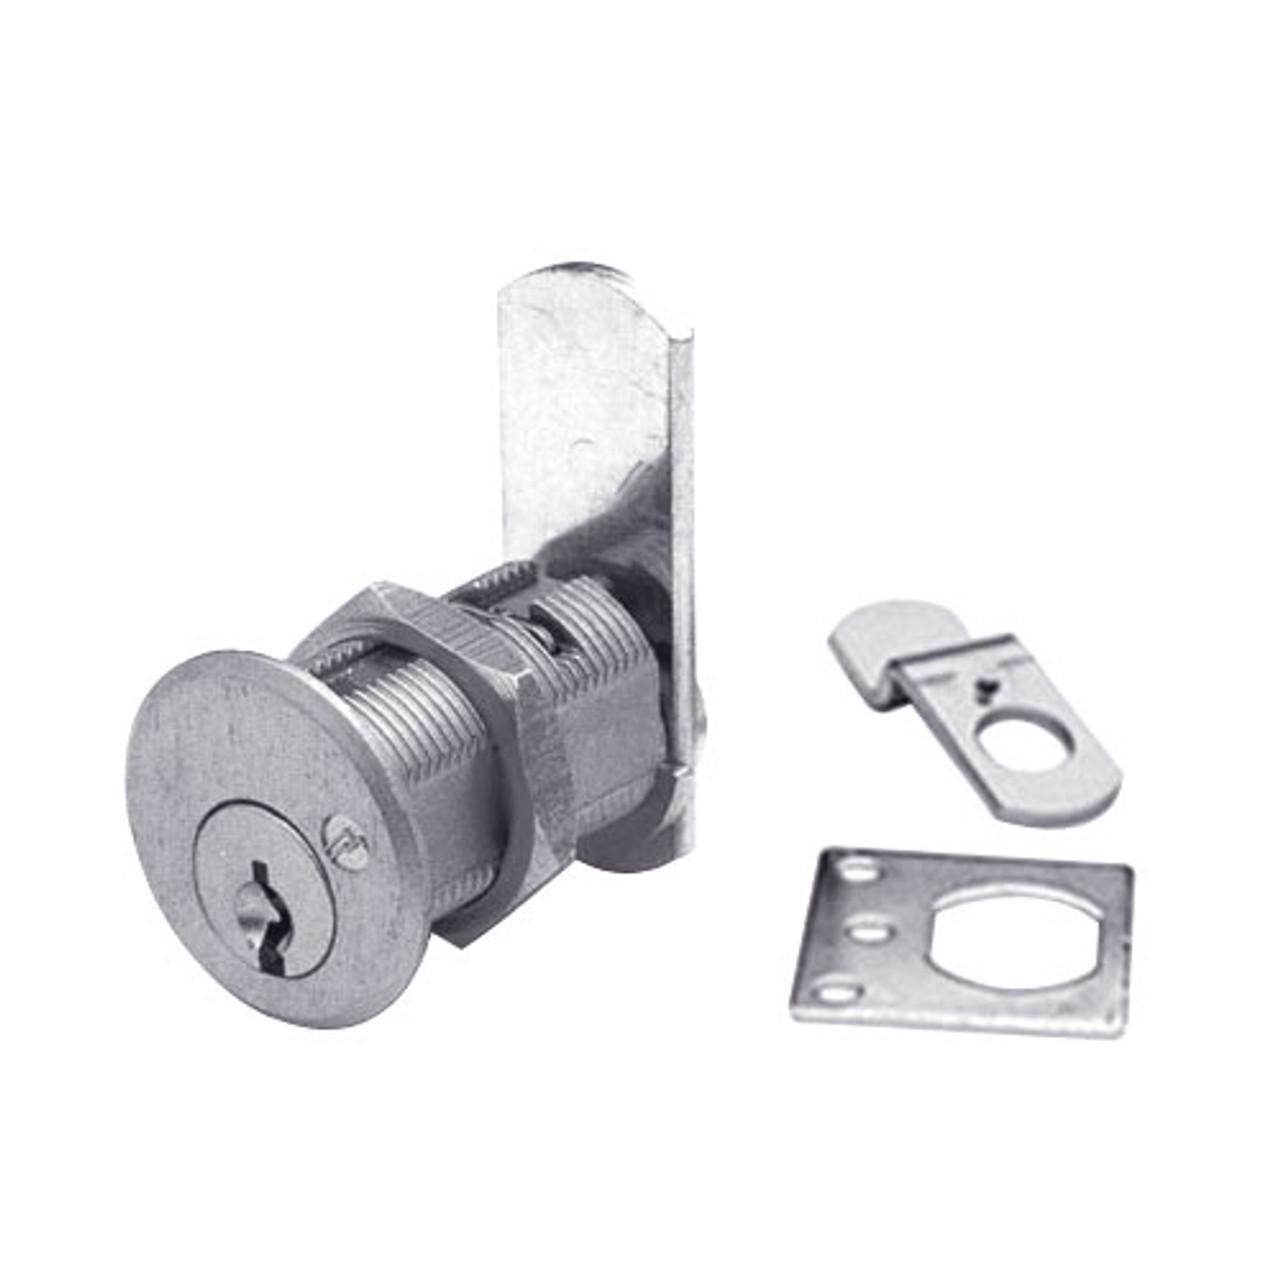 Olympus DCN1-KA915-26D Cam Locks in Satin Chrome Finish